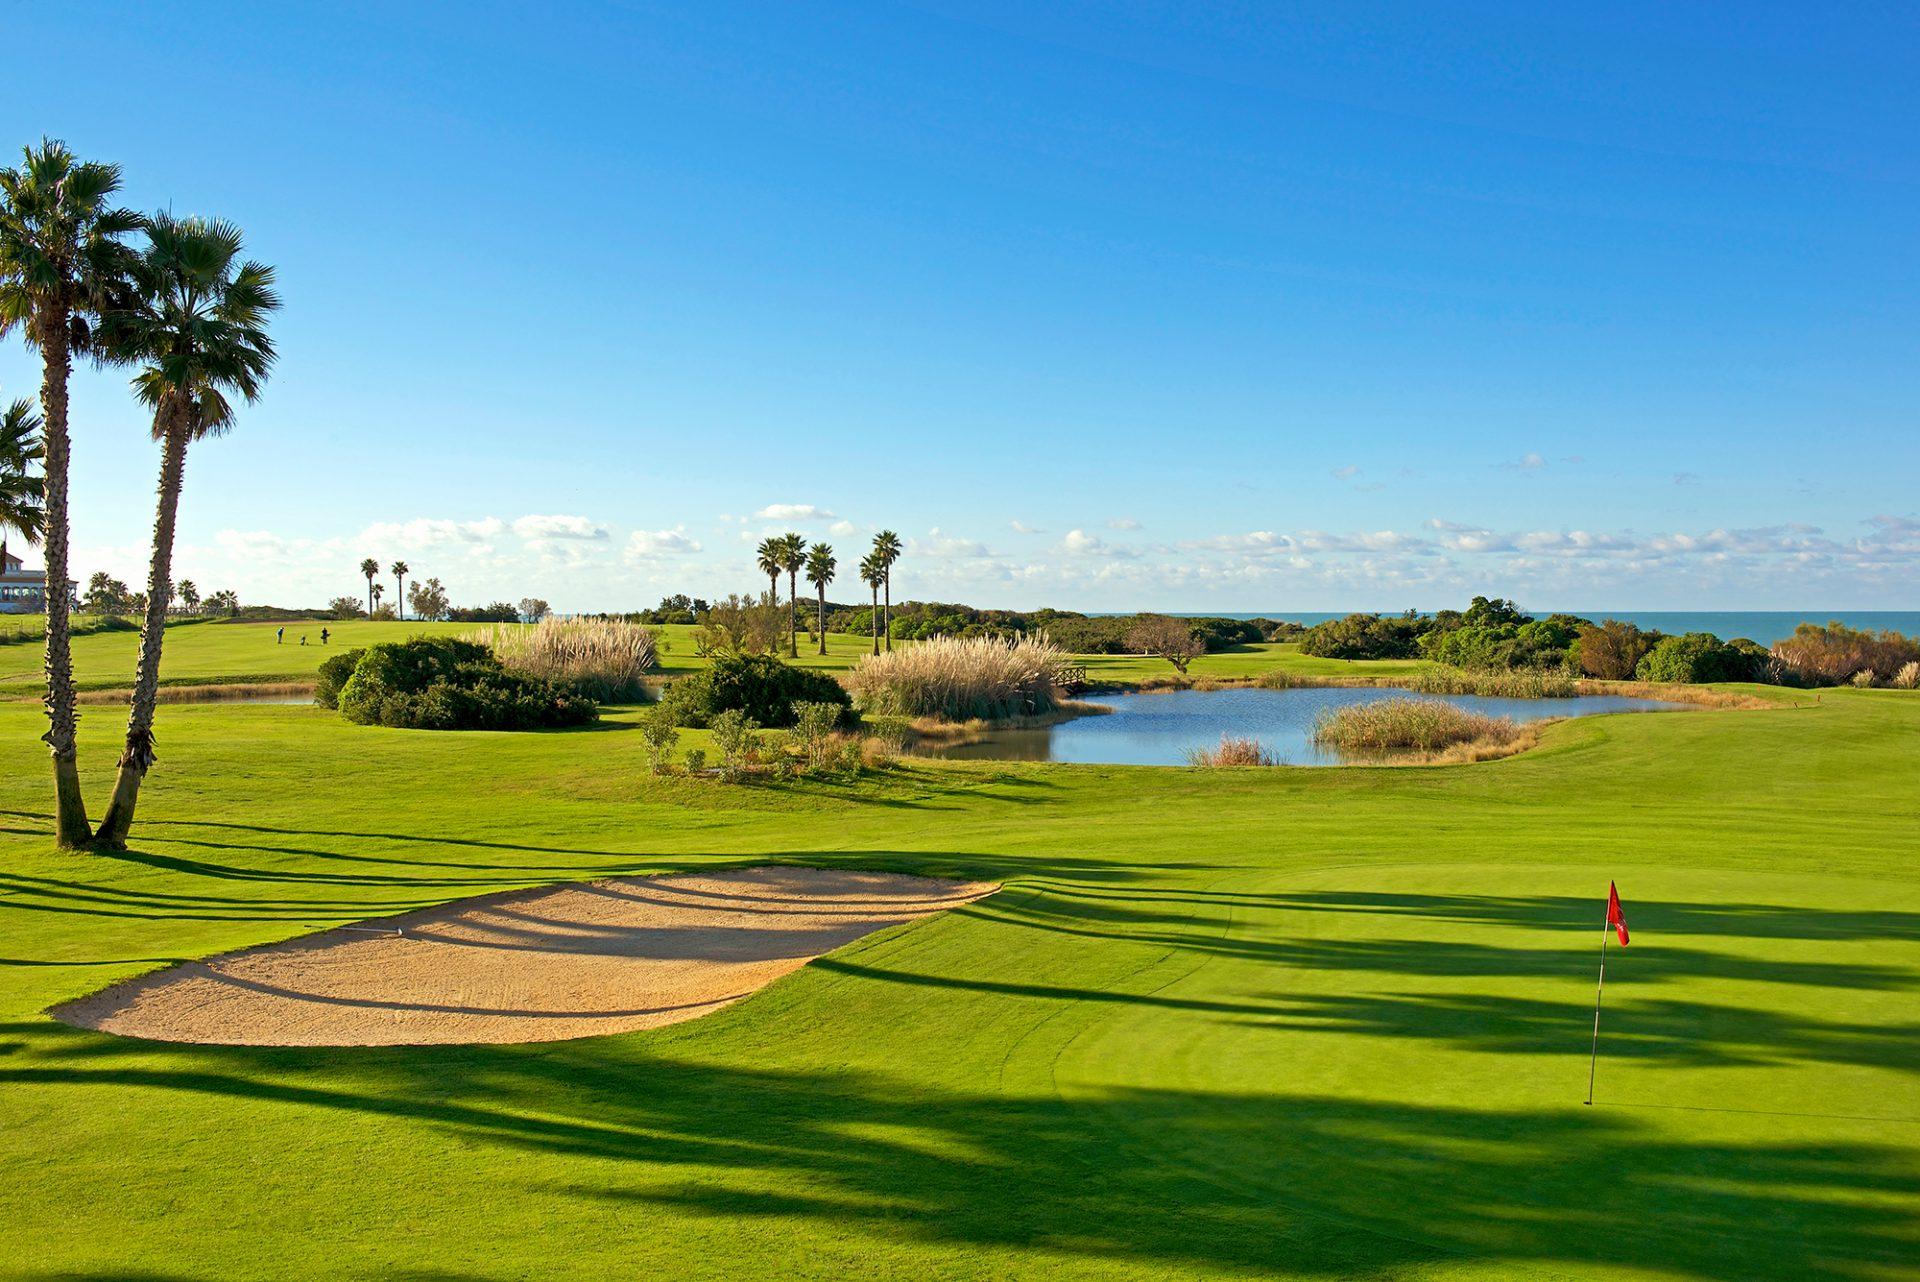 Golfreisen Costa de la Luz - Iberostar Royal Andalus